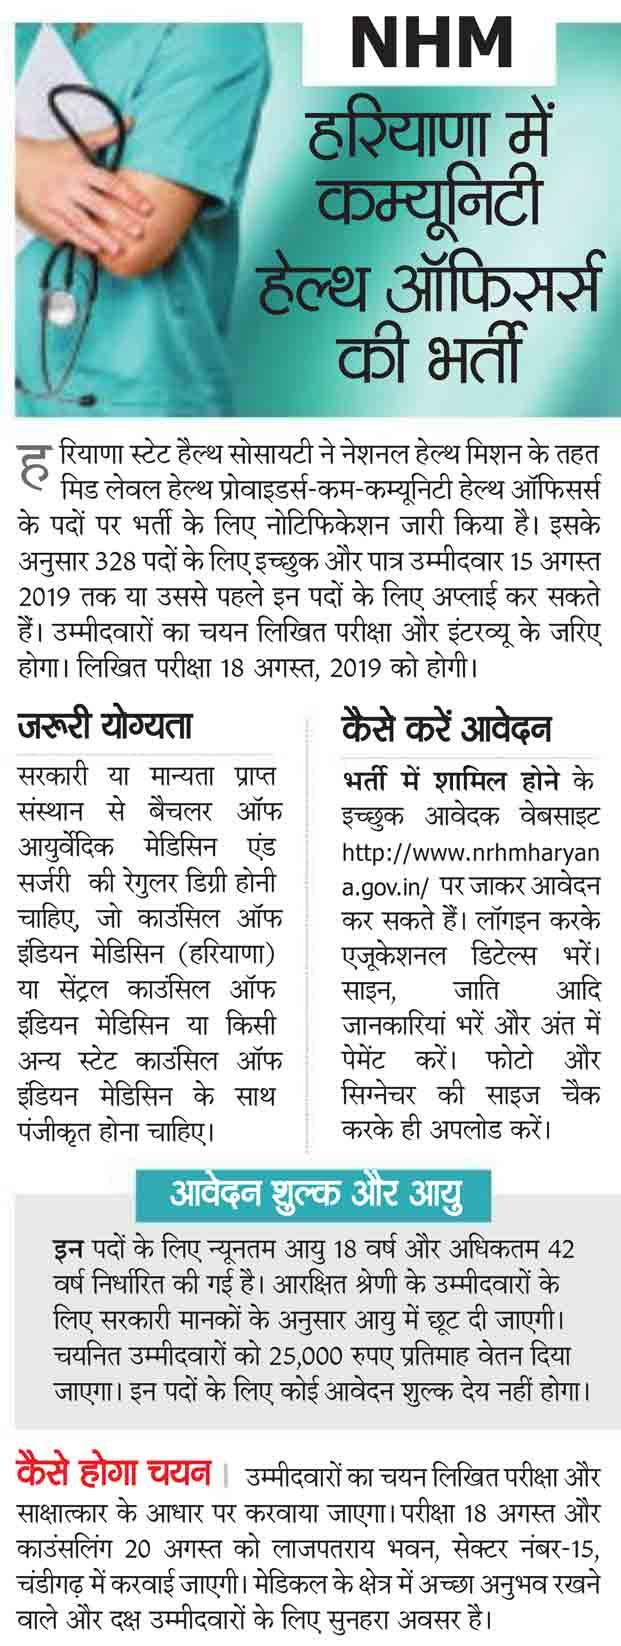 NHM Haryana MLHP cum CHO 2019 Apply Online for 328 Post